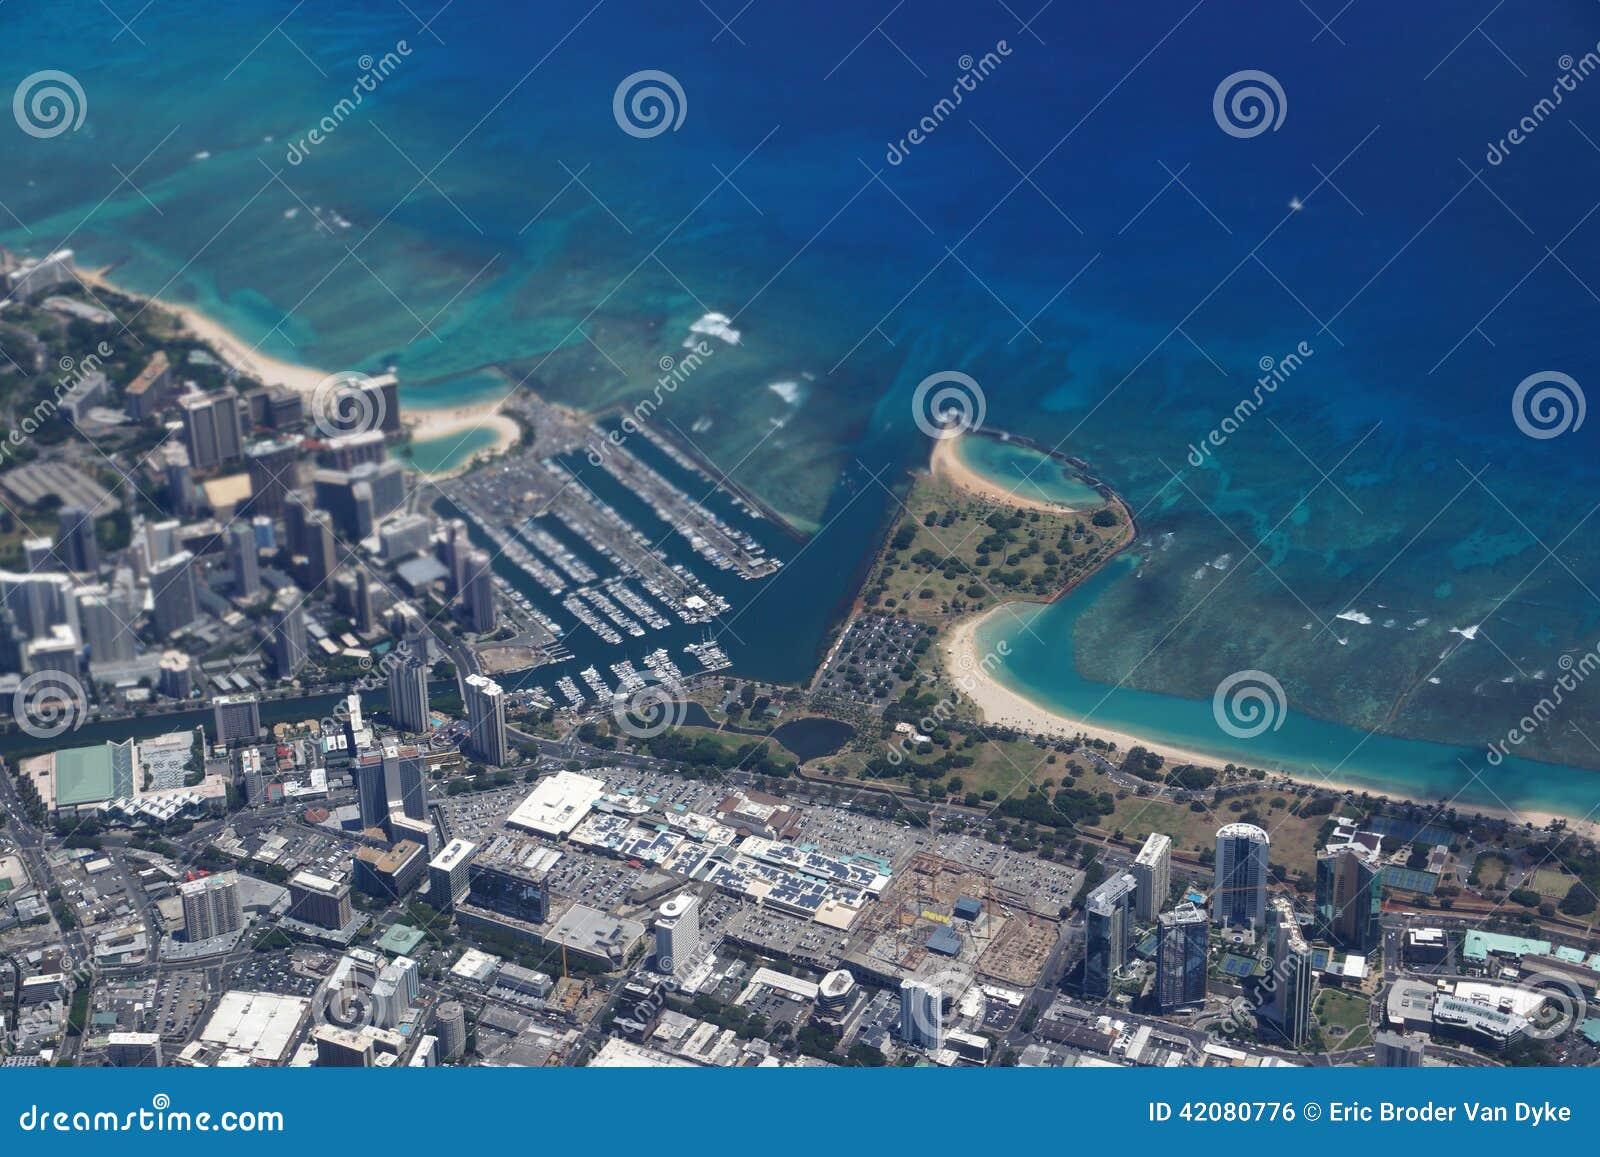 Frangipani spa flowers stock photo image 14654190 - Waikiki Ala Wai Canal Ala Moana Mall Park And Ocean Stock Photo